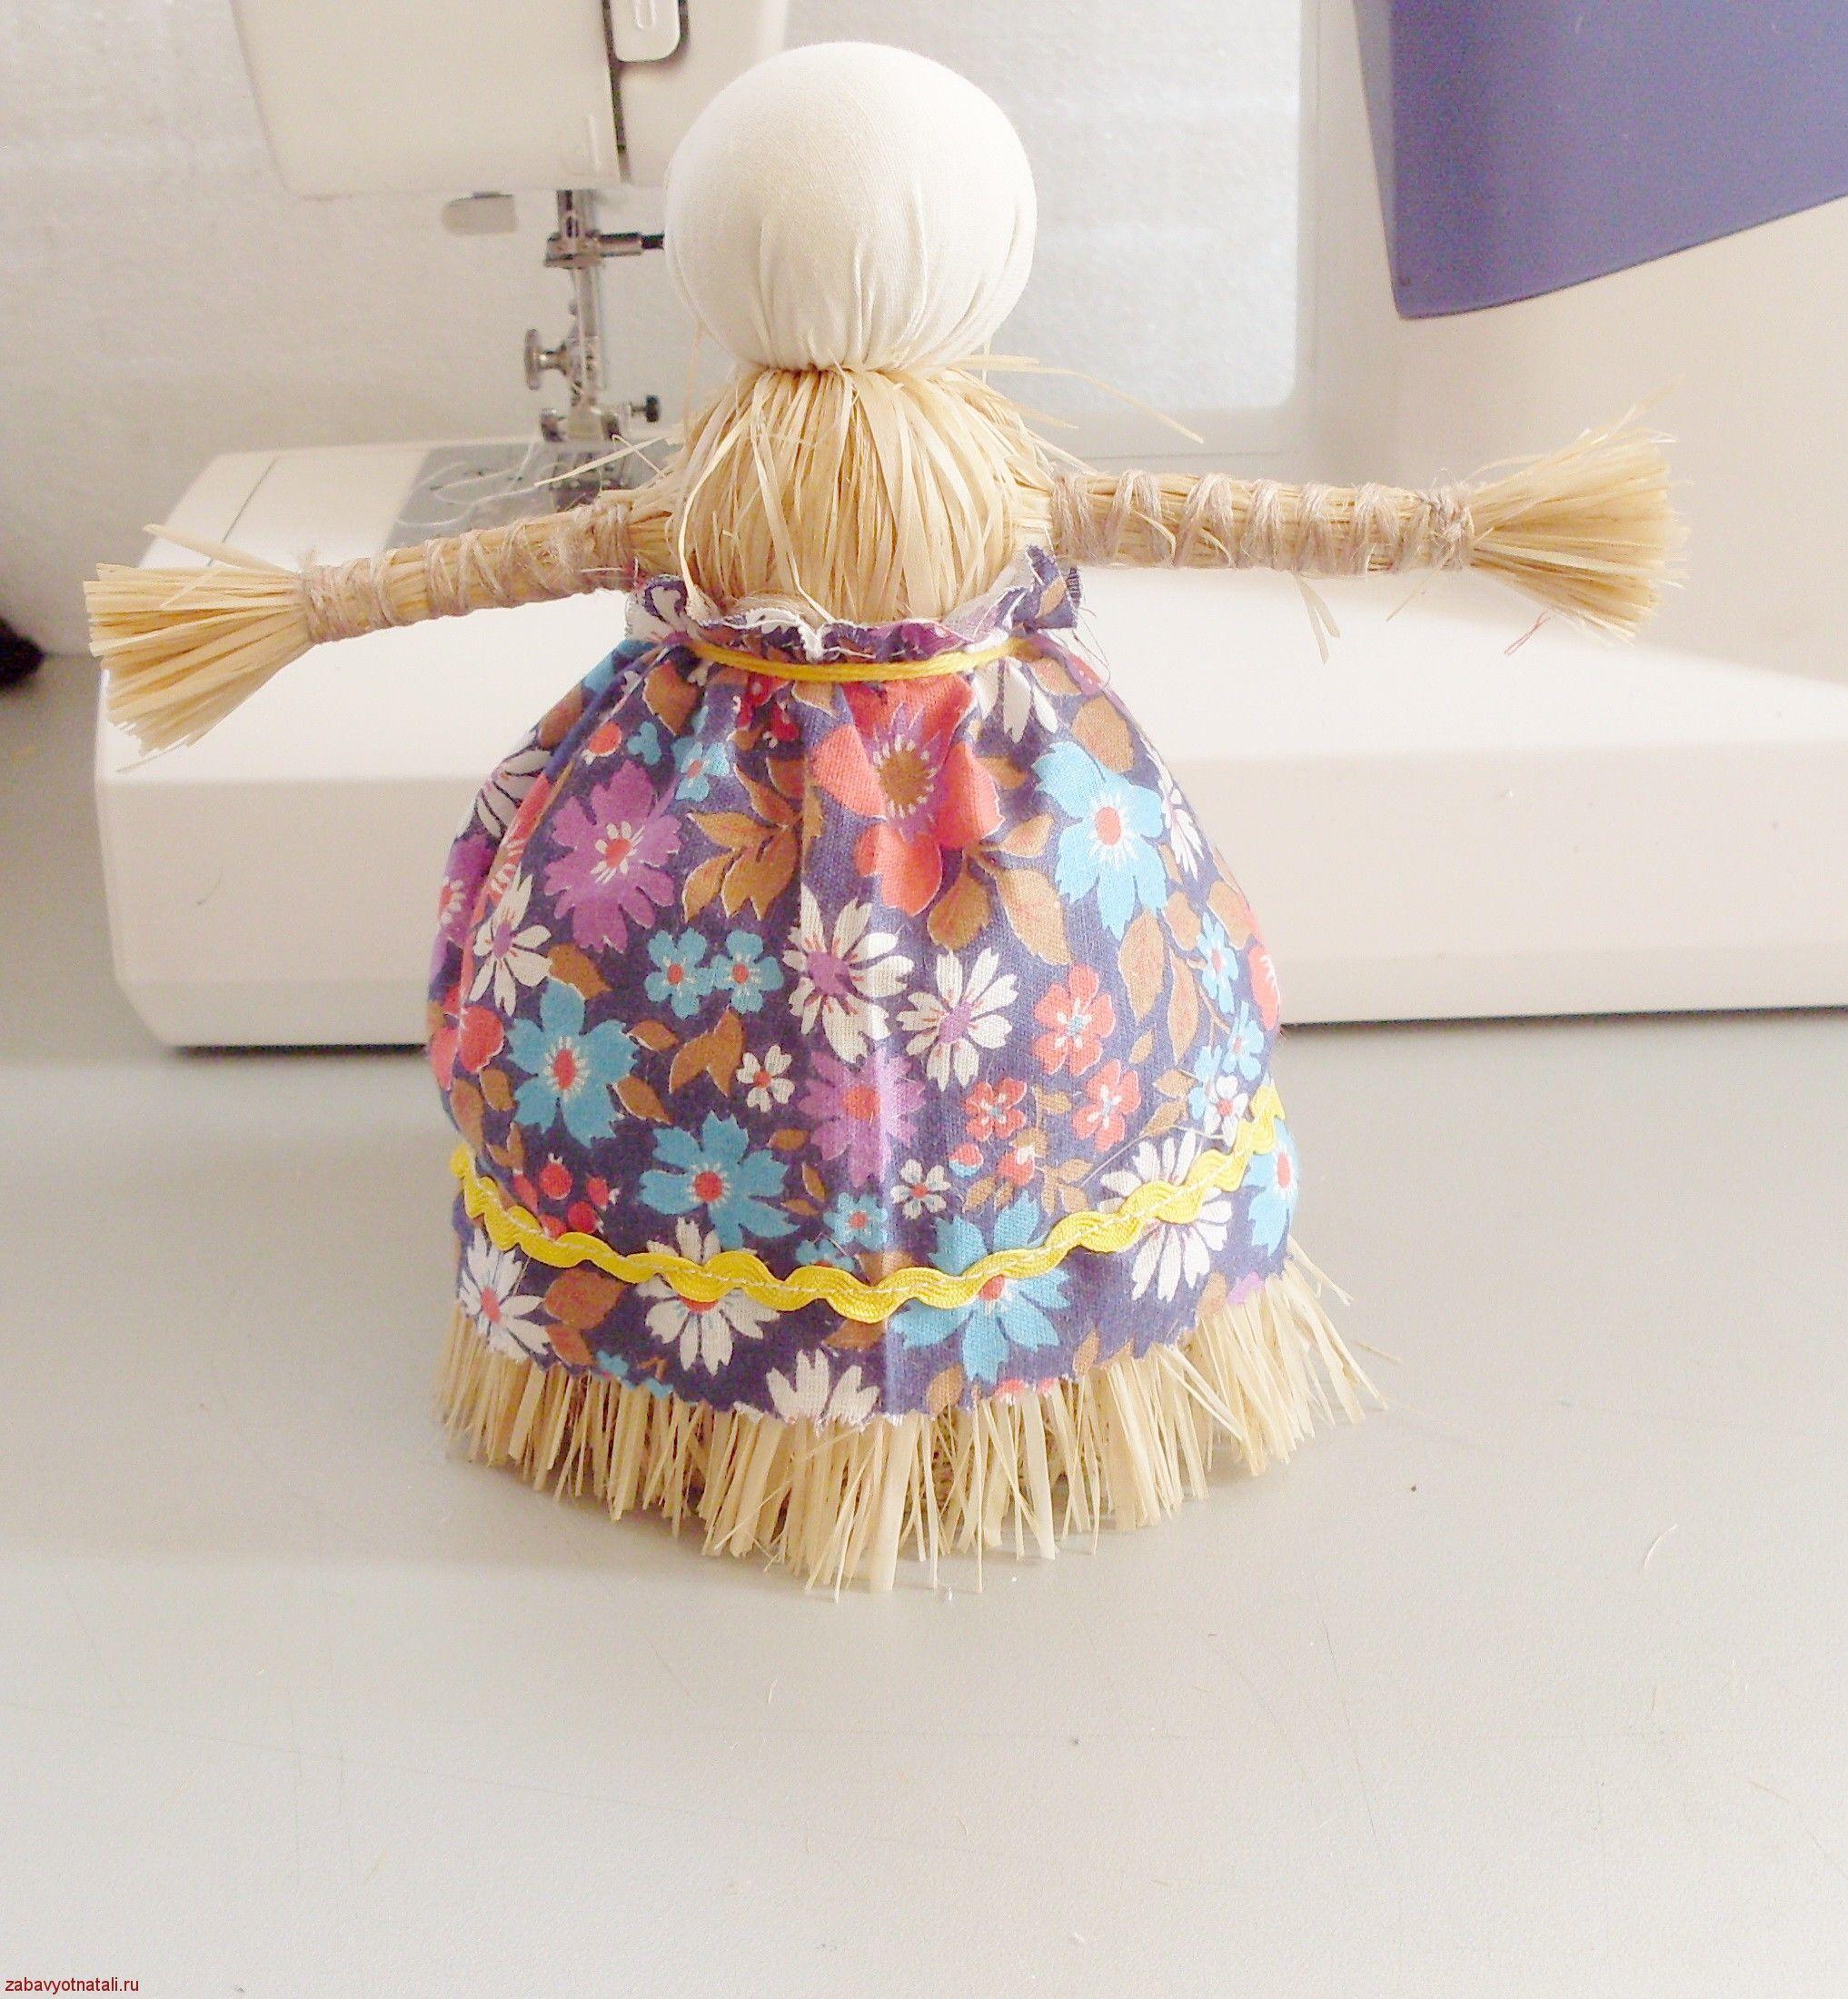 Кукла Масленица своими руками фото куклы